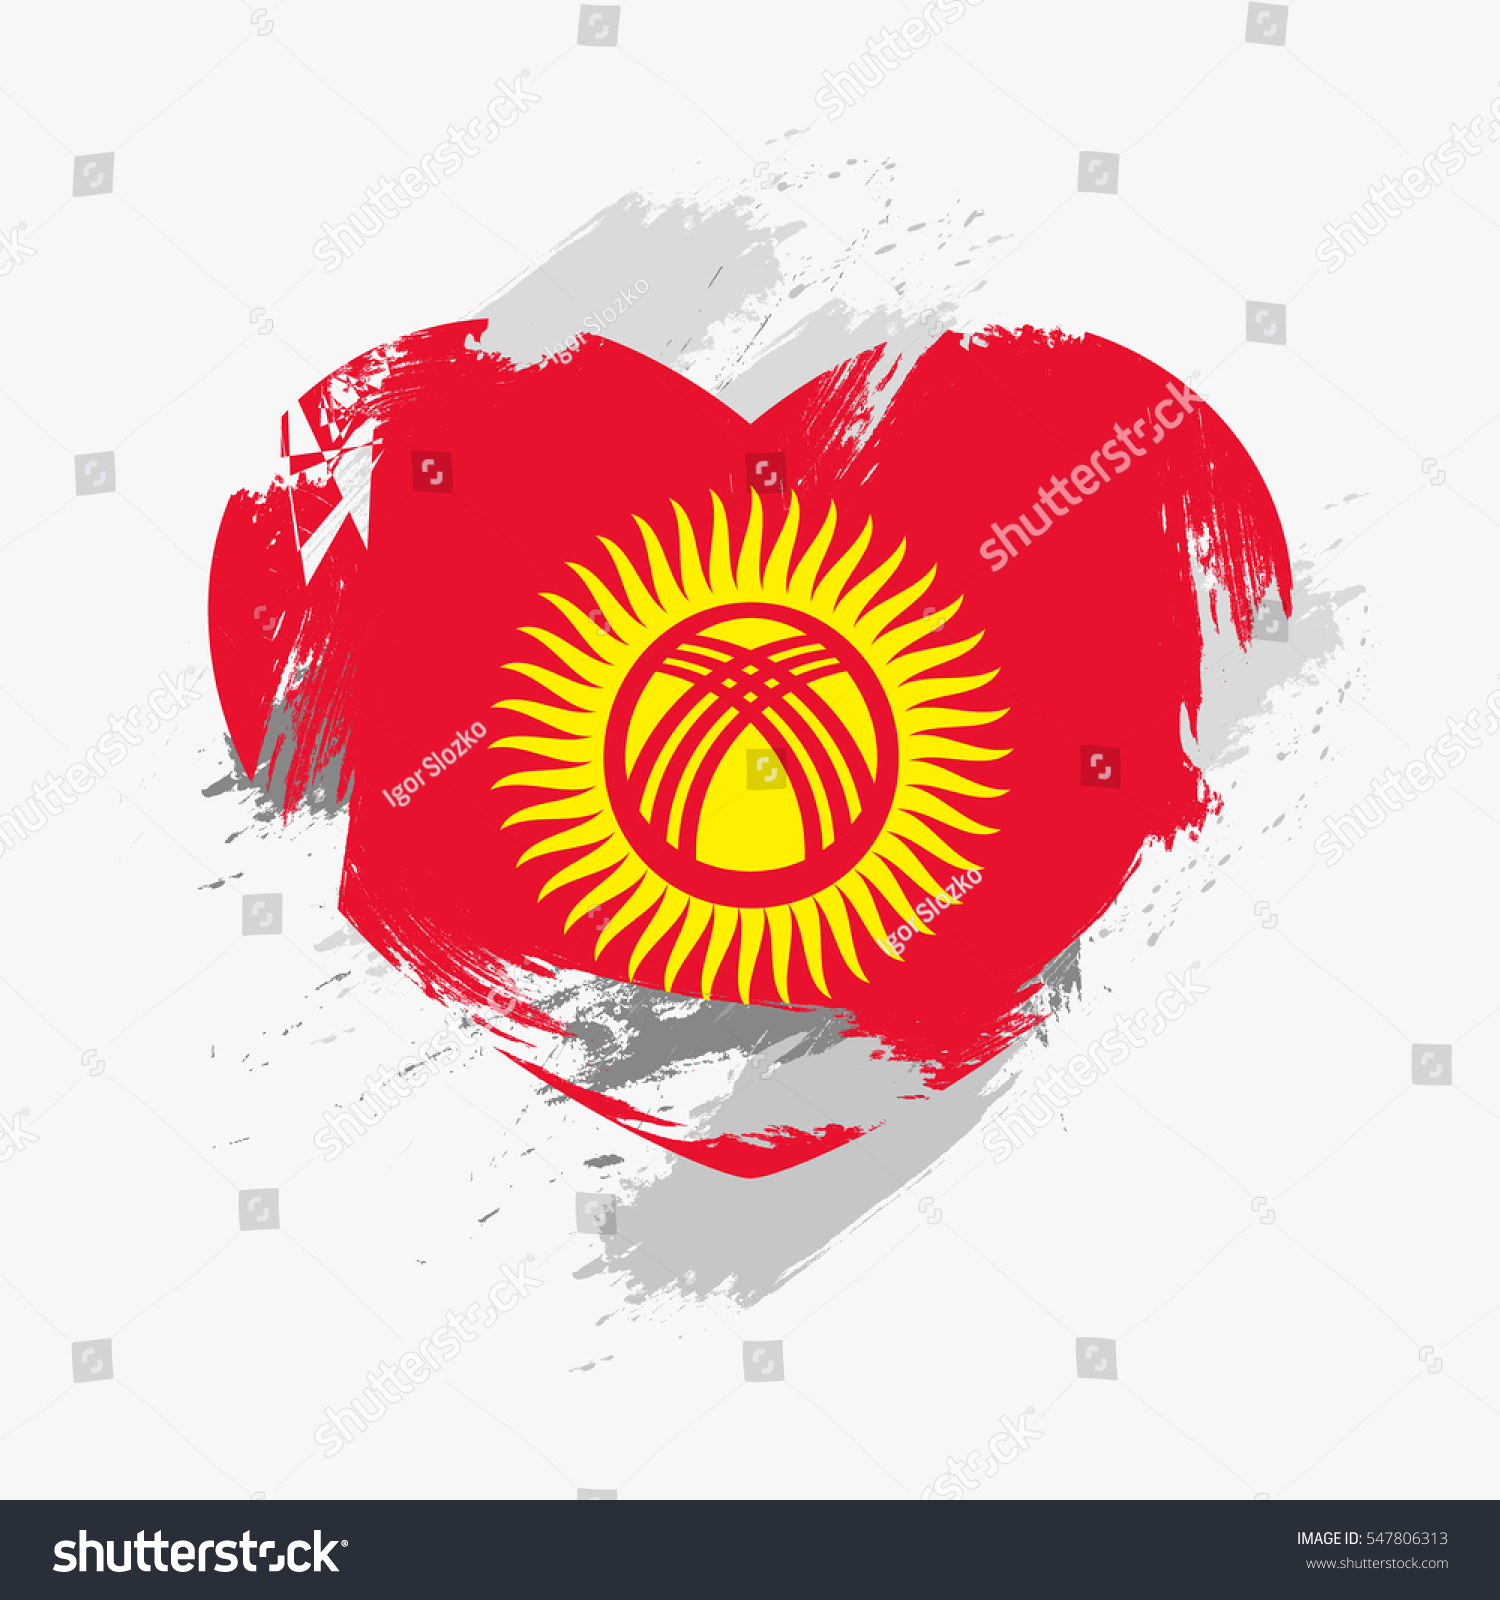 Kyrgyzstan grunge flag photo